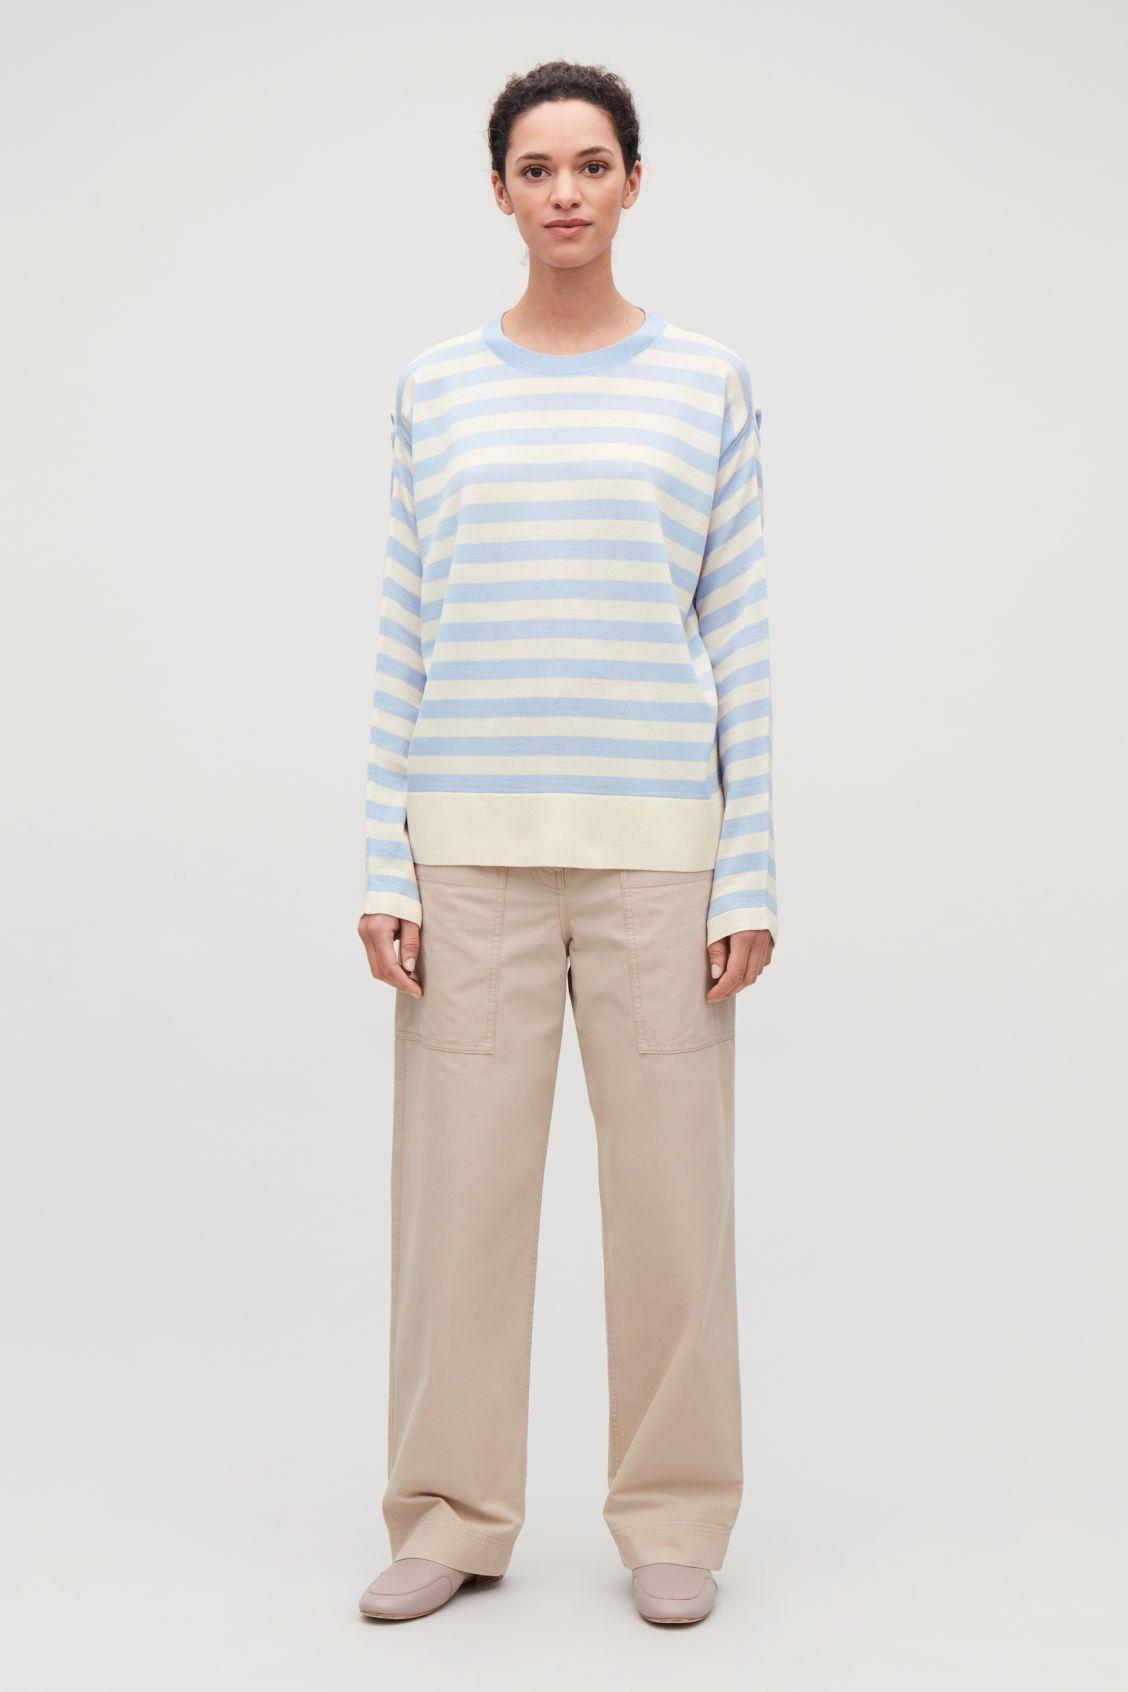 e5ef791944f DRAPED STRIPED MERINO JUMPER - Sky blue / white - Knitwear - COS ...